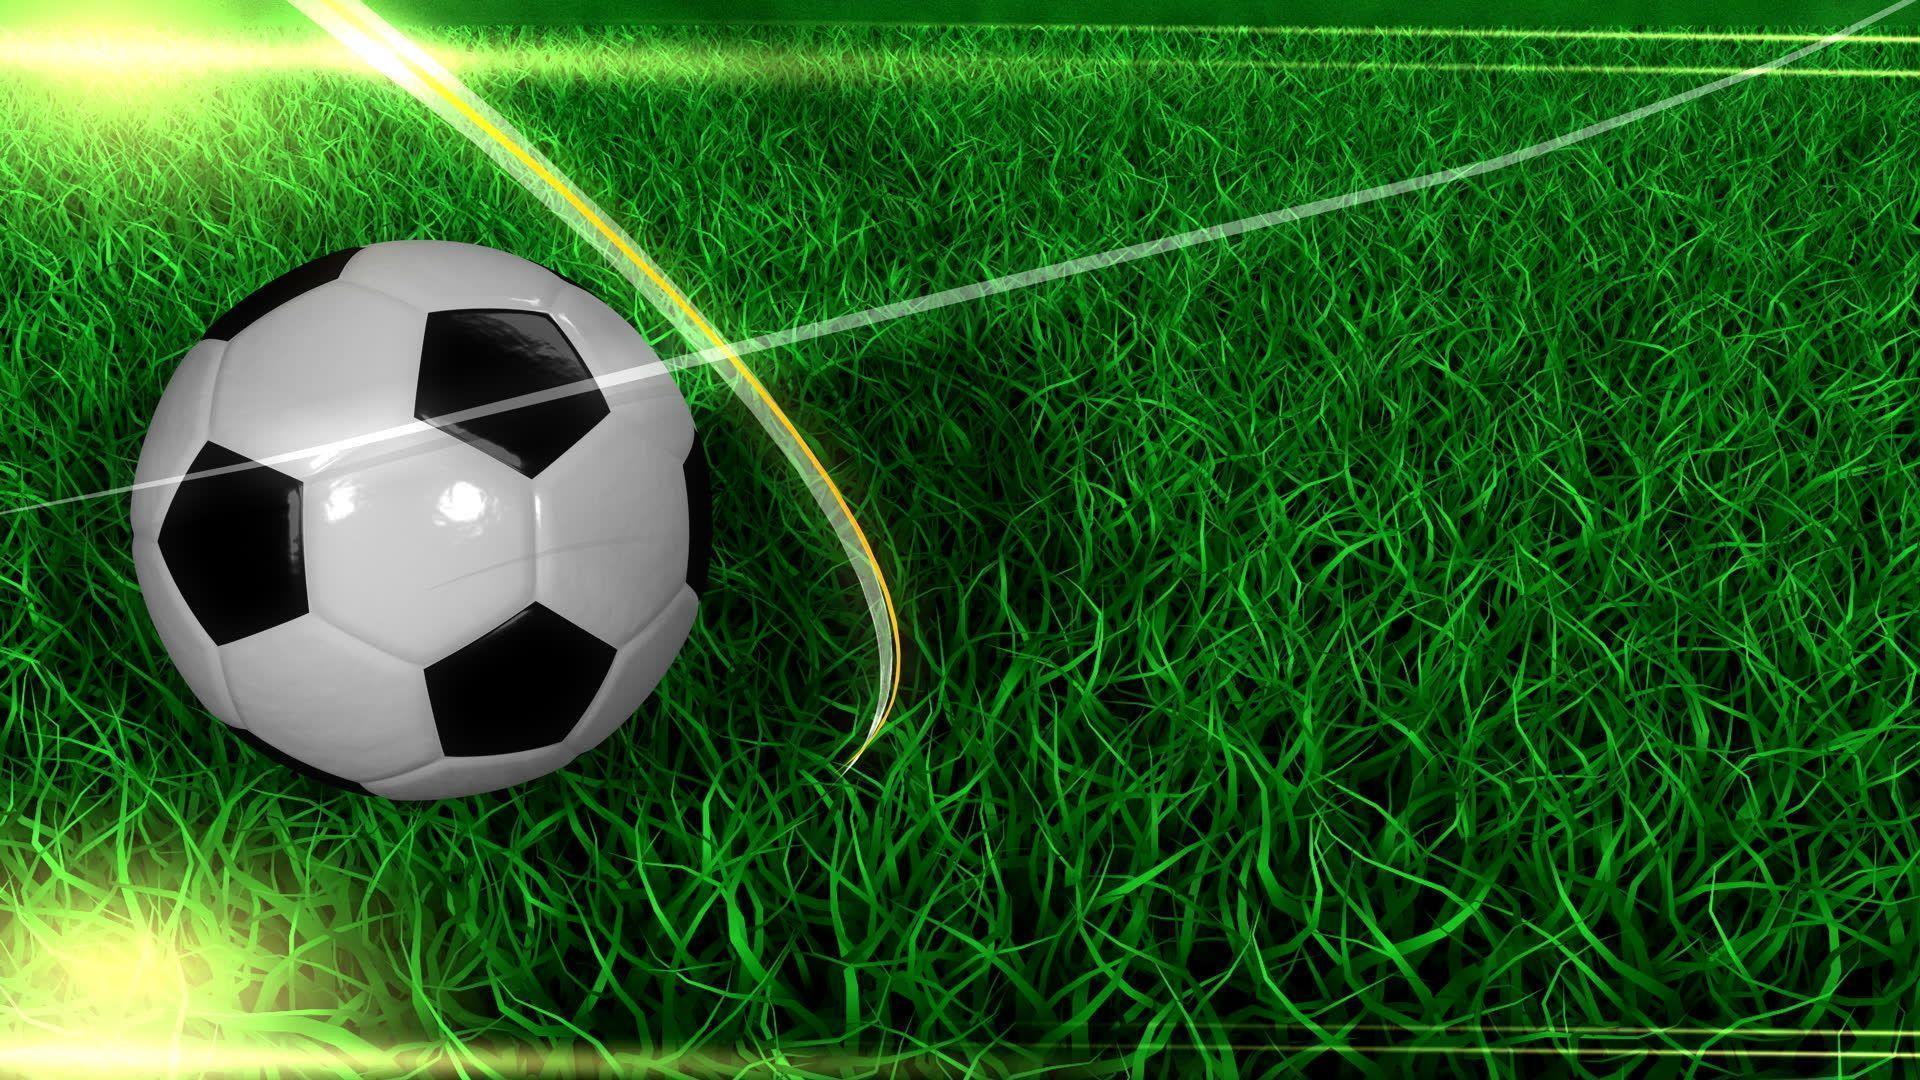 Soccer Backgrounds Image - Wallpaper Cave